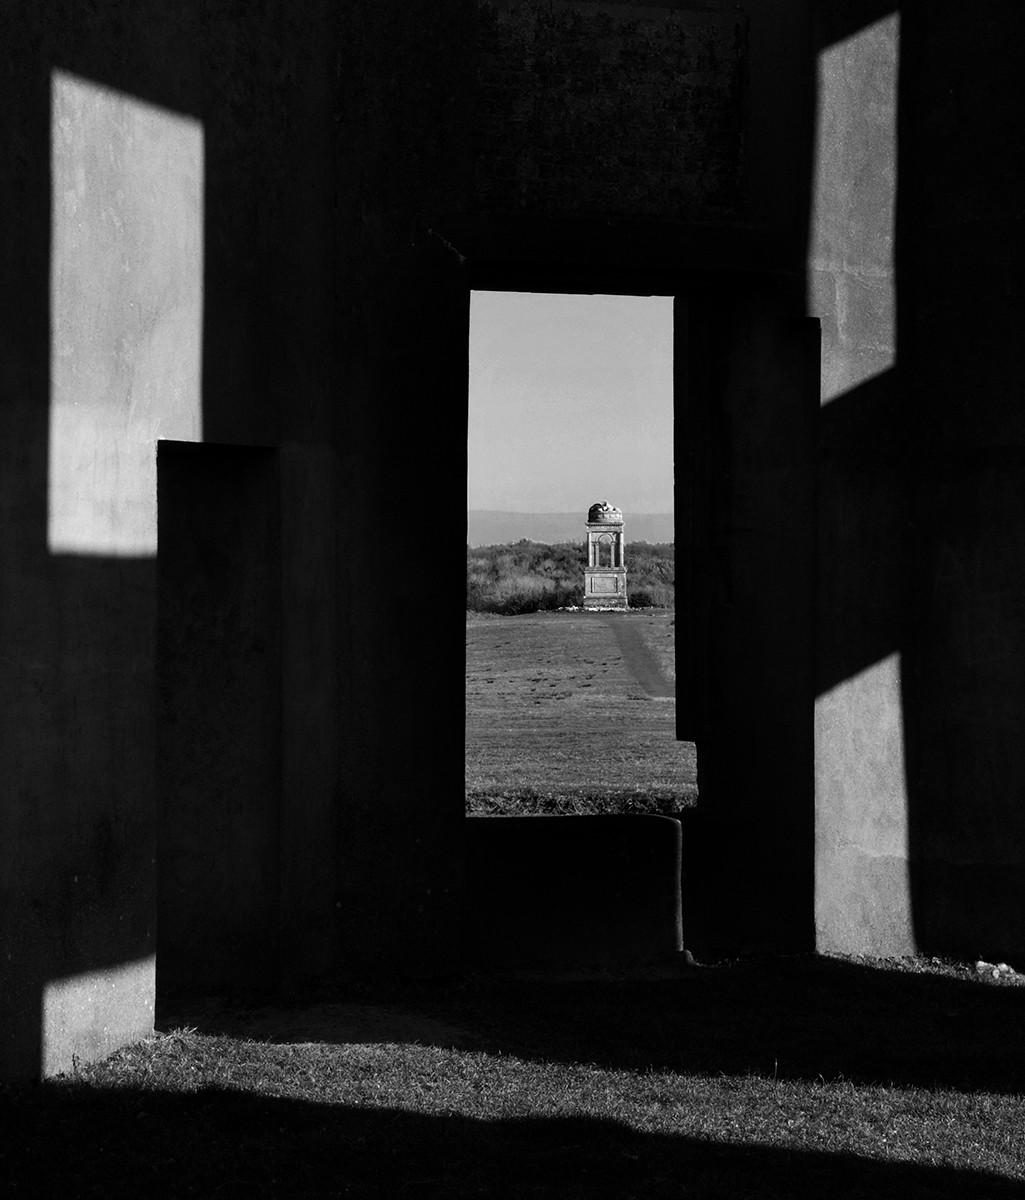 MONO - Window on the World by Leonard Ferguson (7 marks)